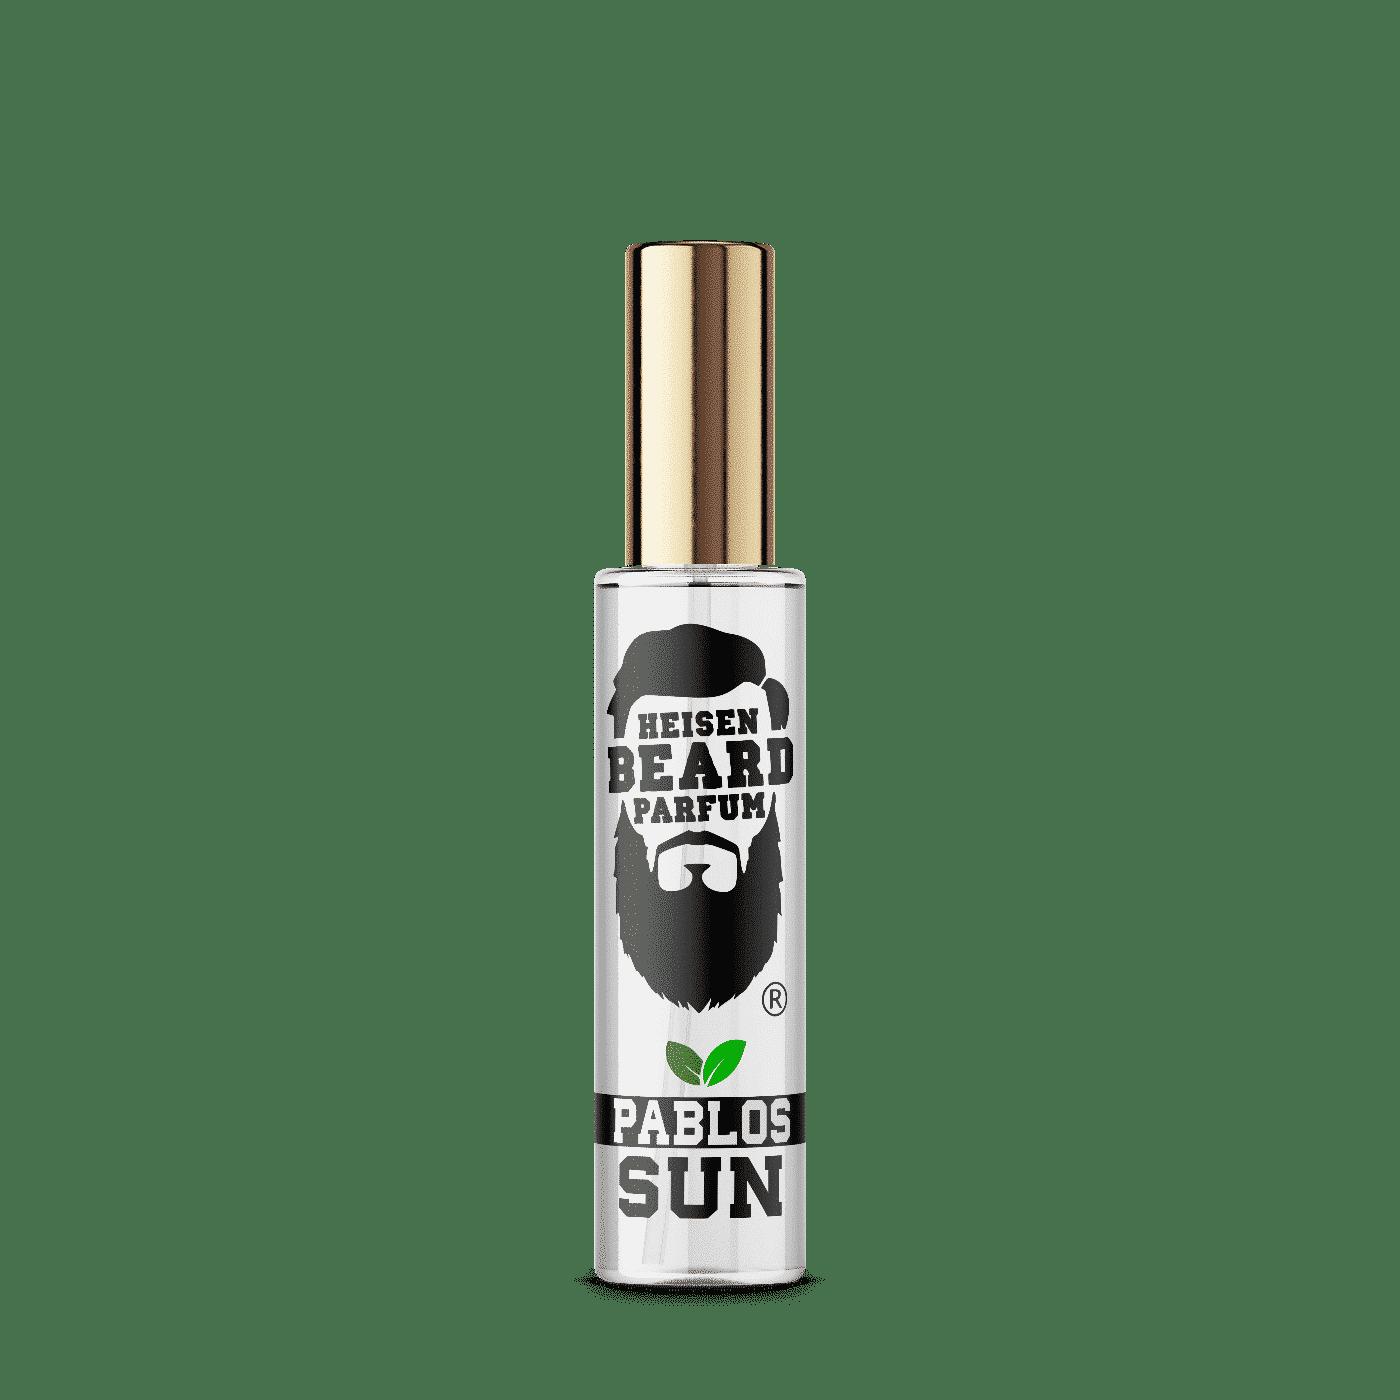 Heisenbeard Parfum - Eau de Parfum - Pablos Sun - 50ml - süß & holzig